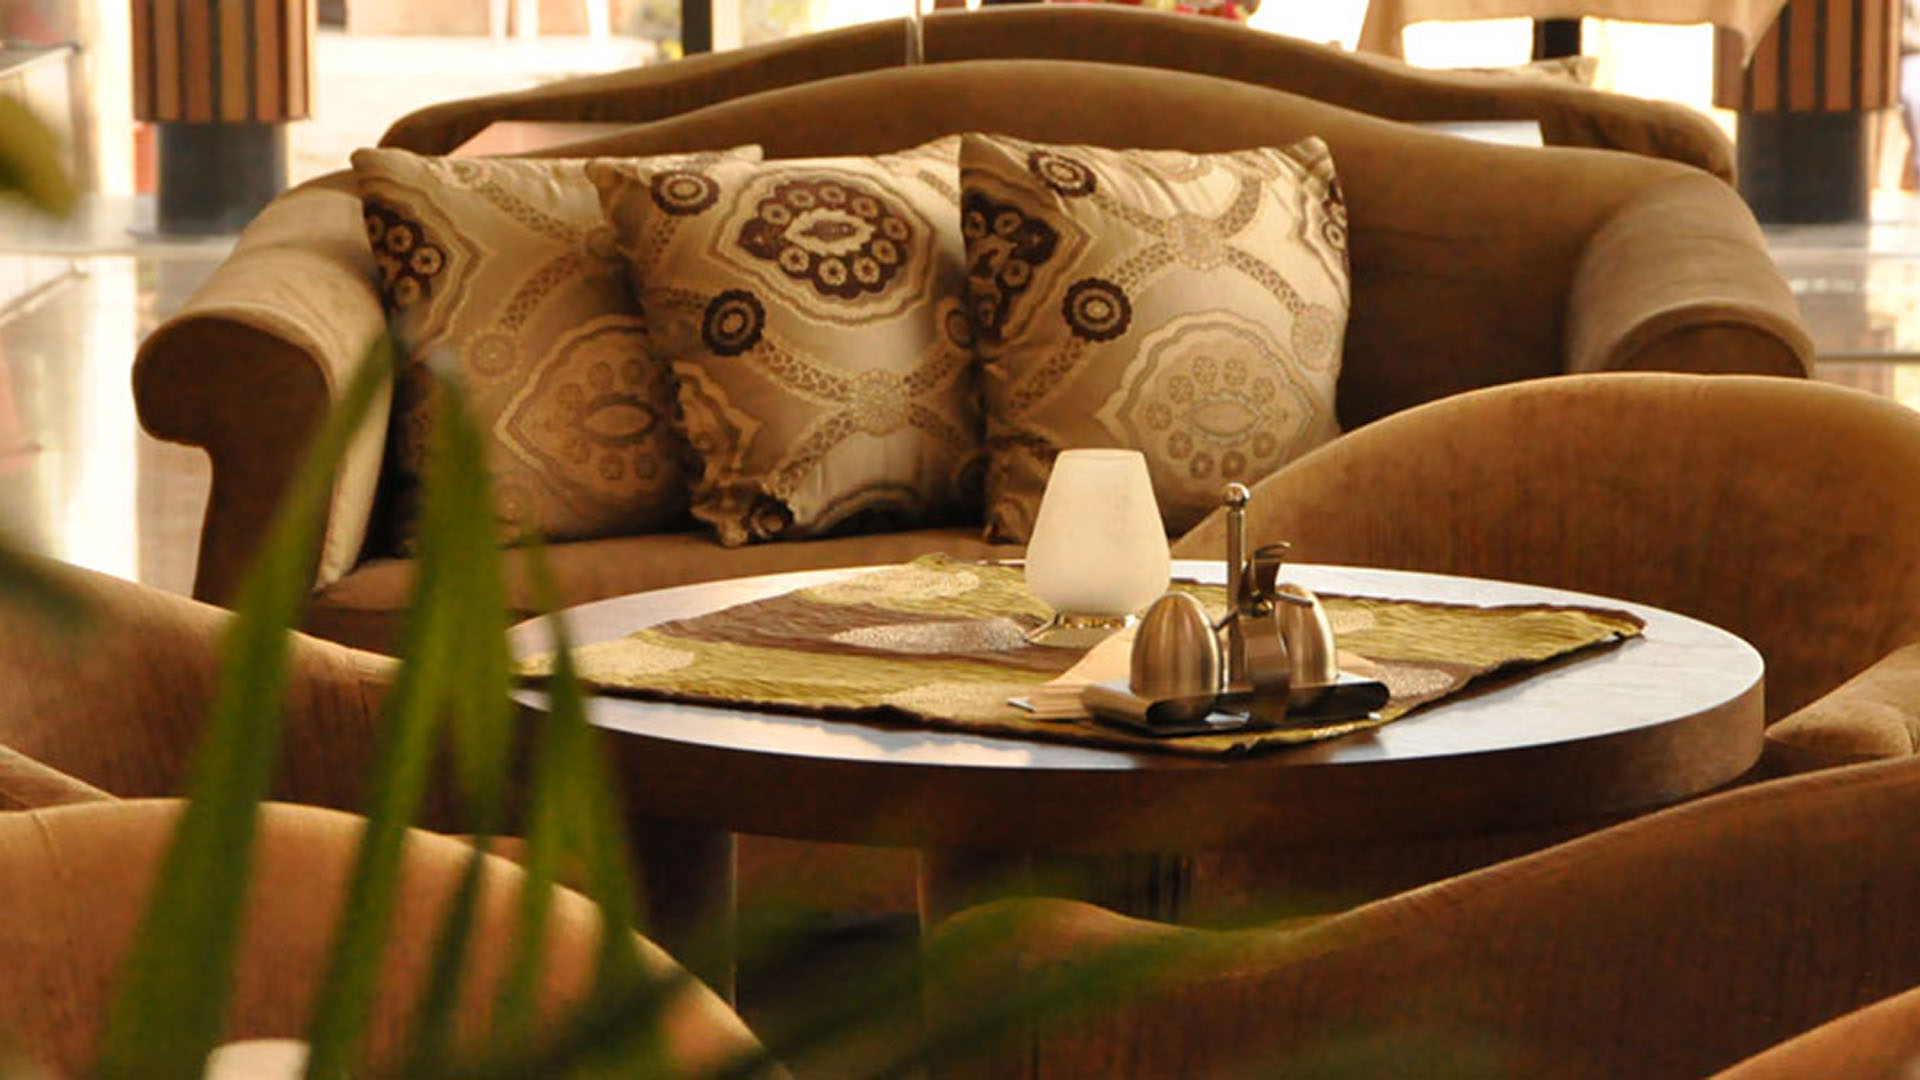 addissinia-hotel-africa-accommodations-ethiopia-maasai-wanderings-safari-chair